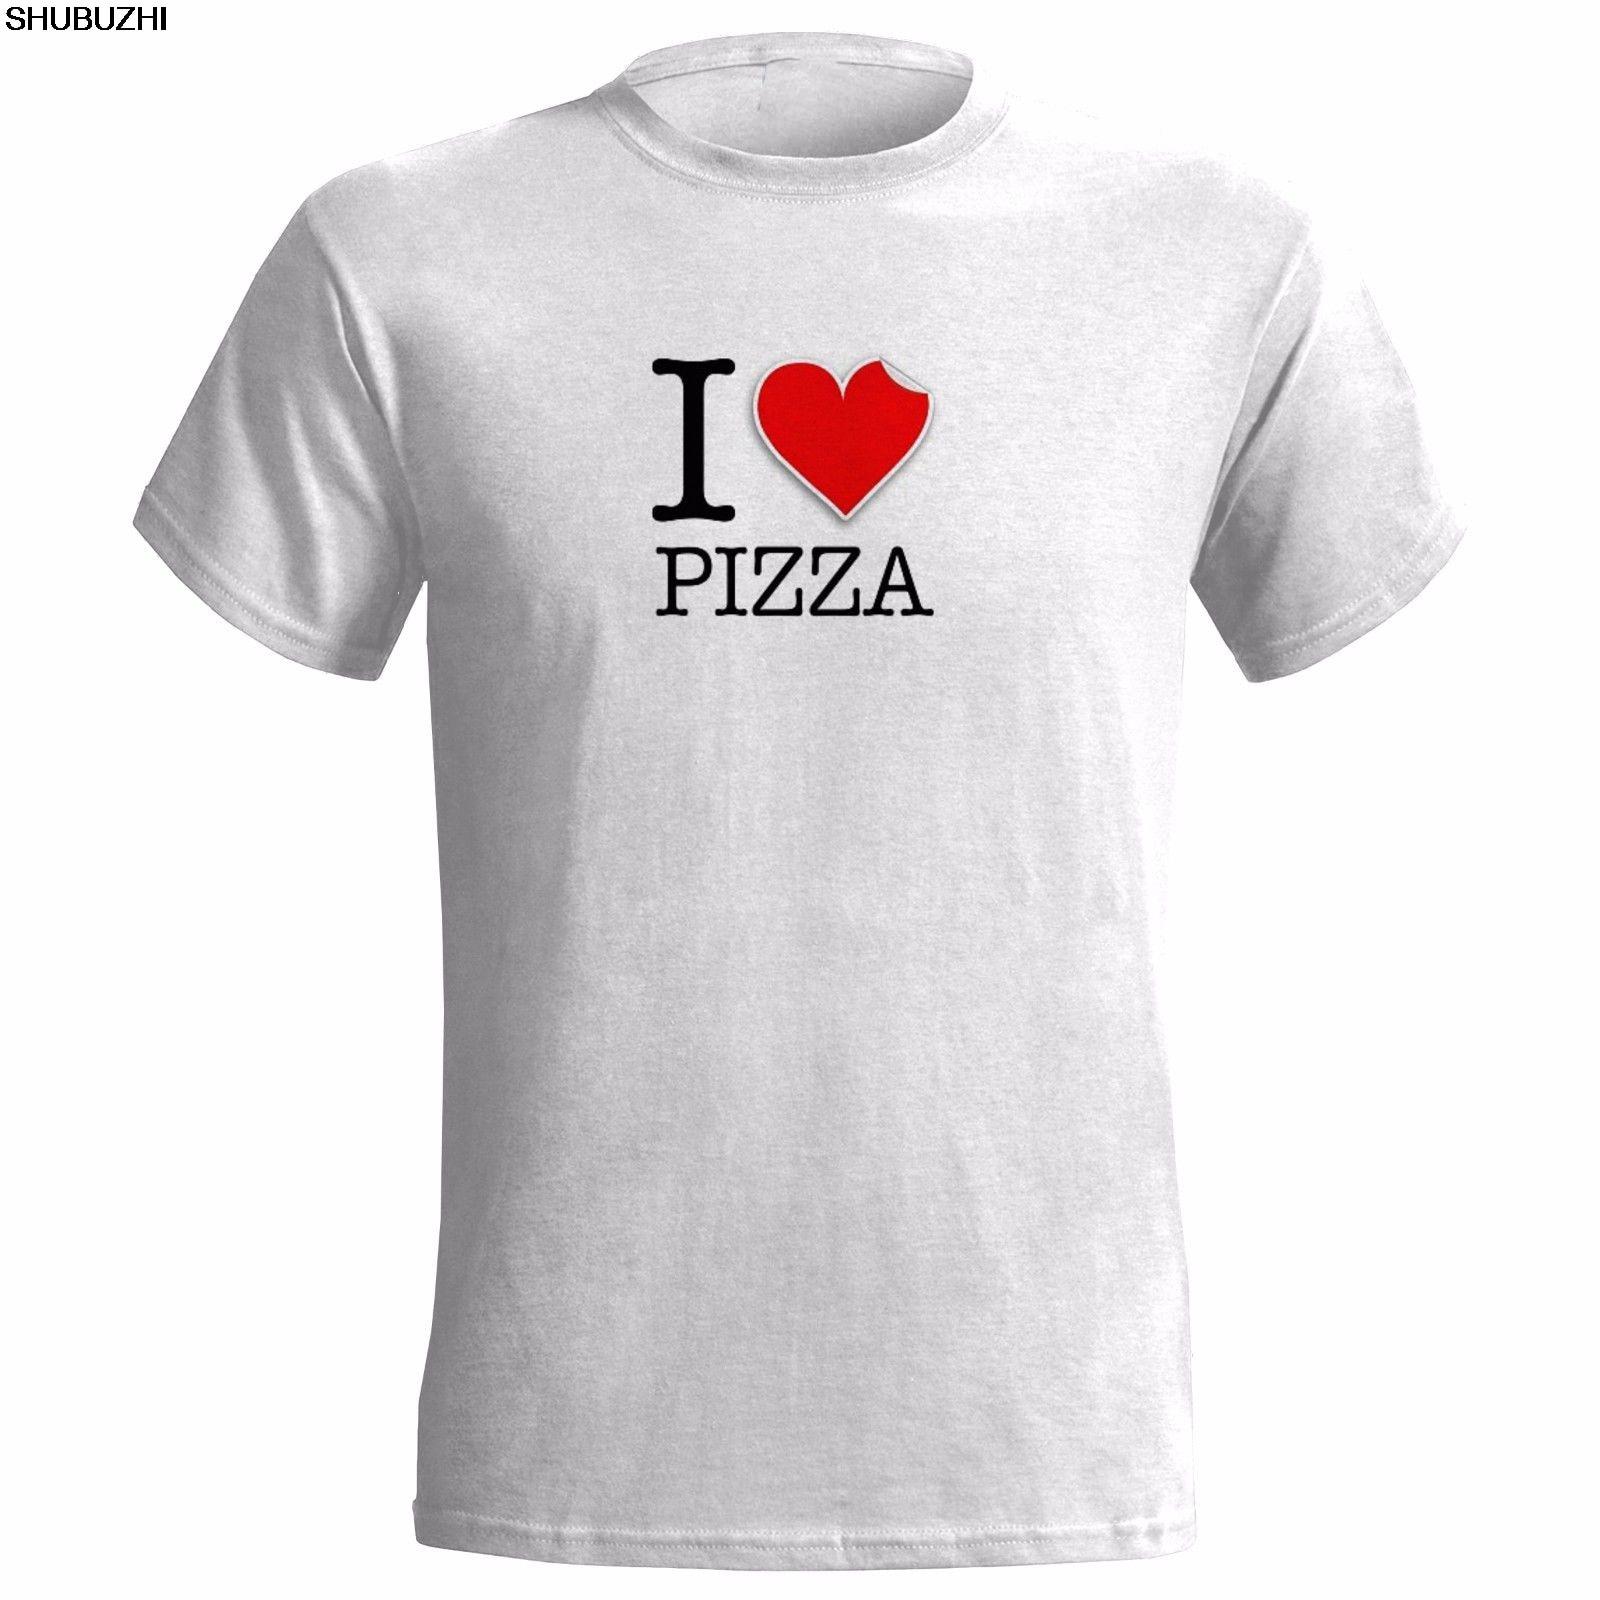 2941e8065 I LOVE PIZZA LOGO MENS T SHIRT FOOD EAT ITALIAN TAKEAWAY GIFT PRESENT TAKE  AWAY tshirt